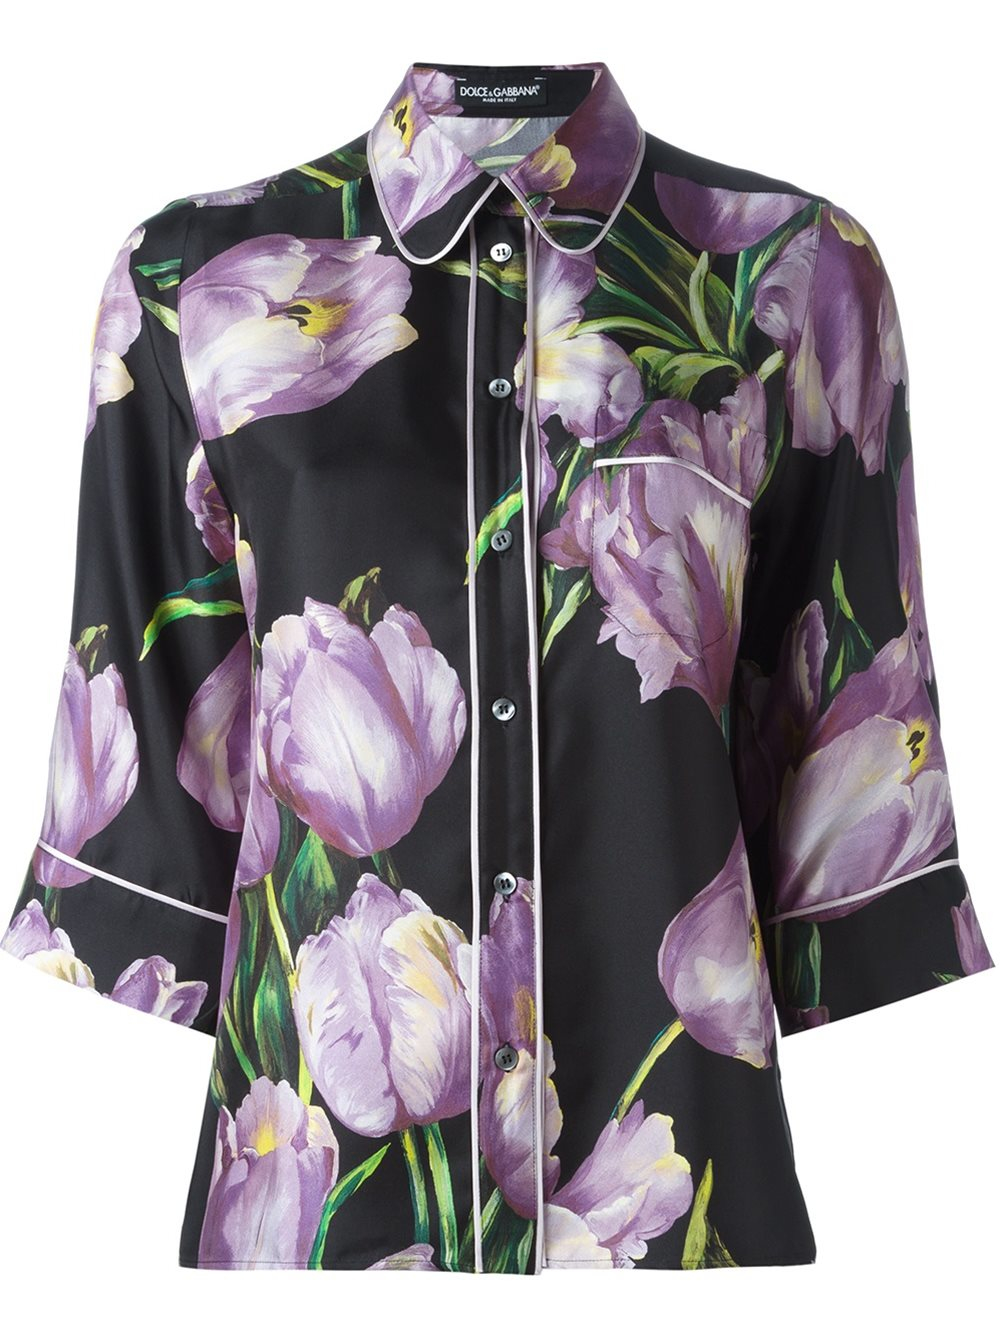 07e92cdce285a https   www.lyst.com clothing stella-mccartney-ellie-leaping-balconette ...